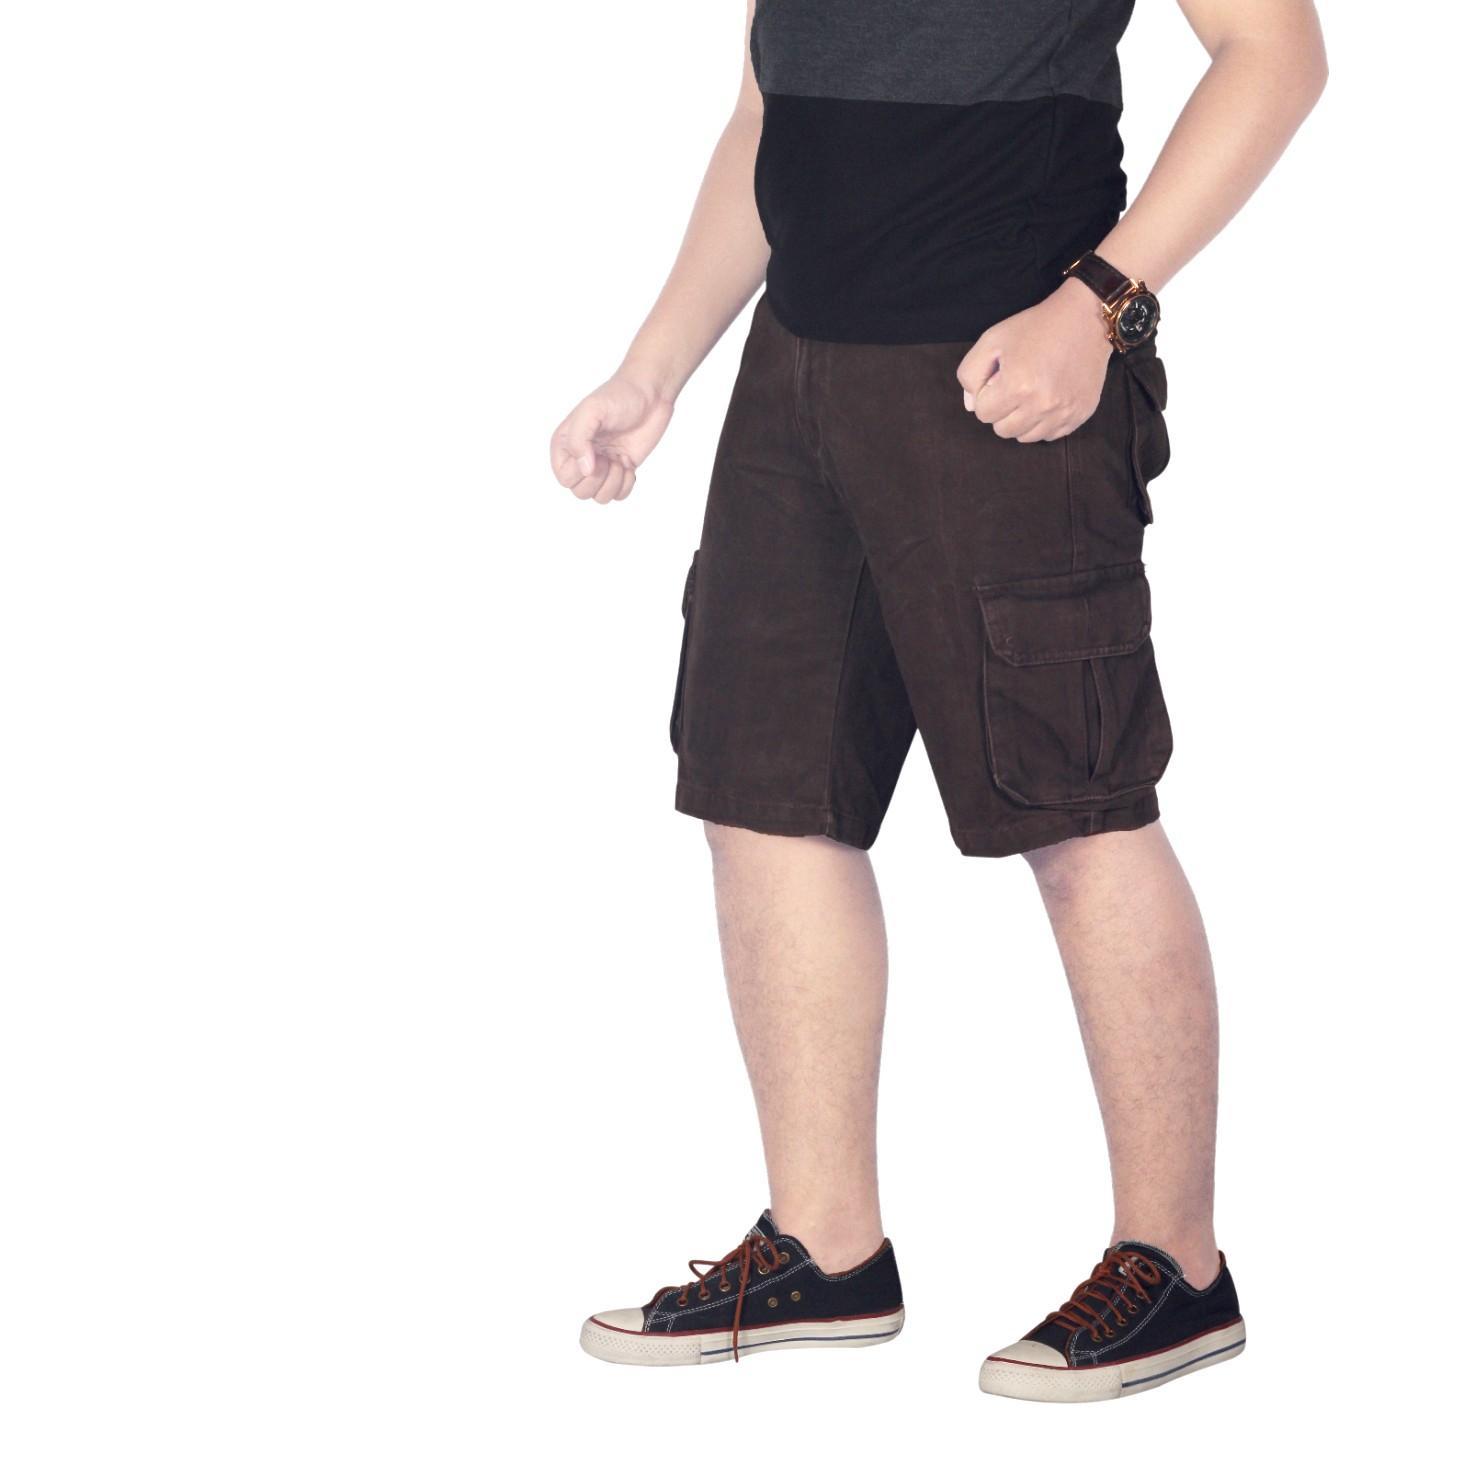 Bsg_Fashion1 Celana Pendek Hitam Polos Distro Import/ Celana Skinny/Celana Pants/Celana Santai/Celana Casual/Celana Motif/Celana Polos/Celana Pria/Celana Cino/Celana Pantai/Celana Denim/Celana Jeans / CELENA ARMY / CELANA JEANS KARGO /CELANA KARGO AN 5695